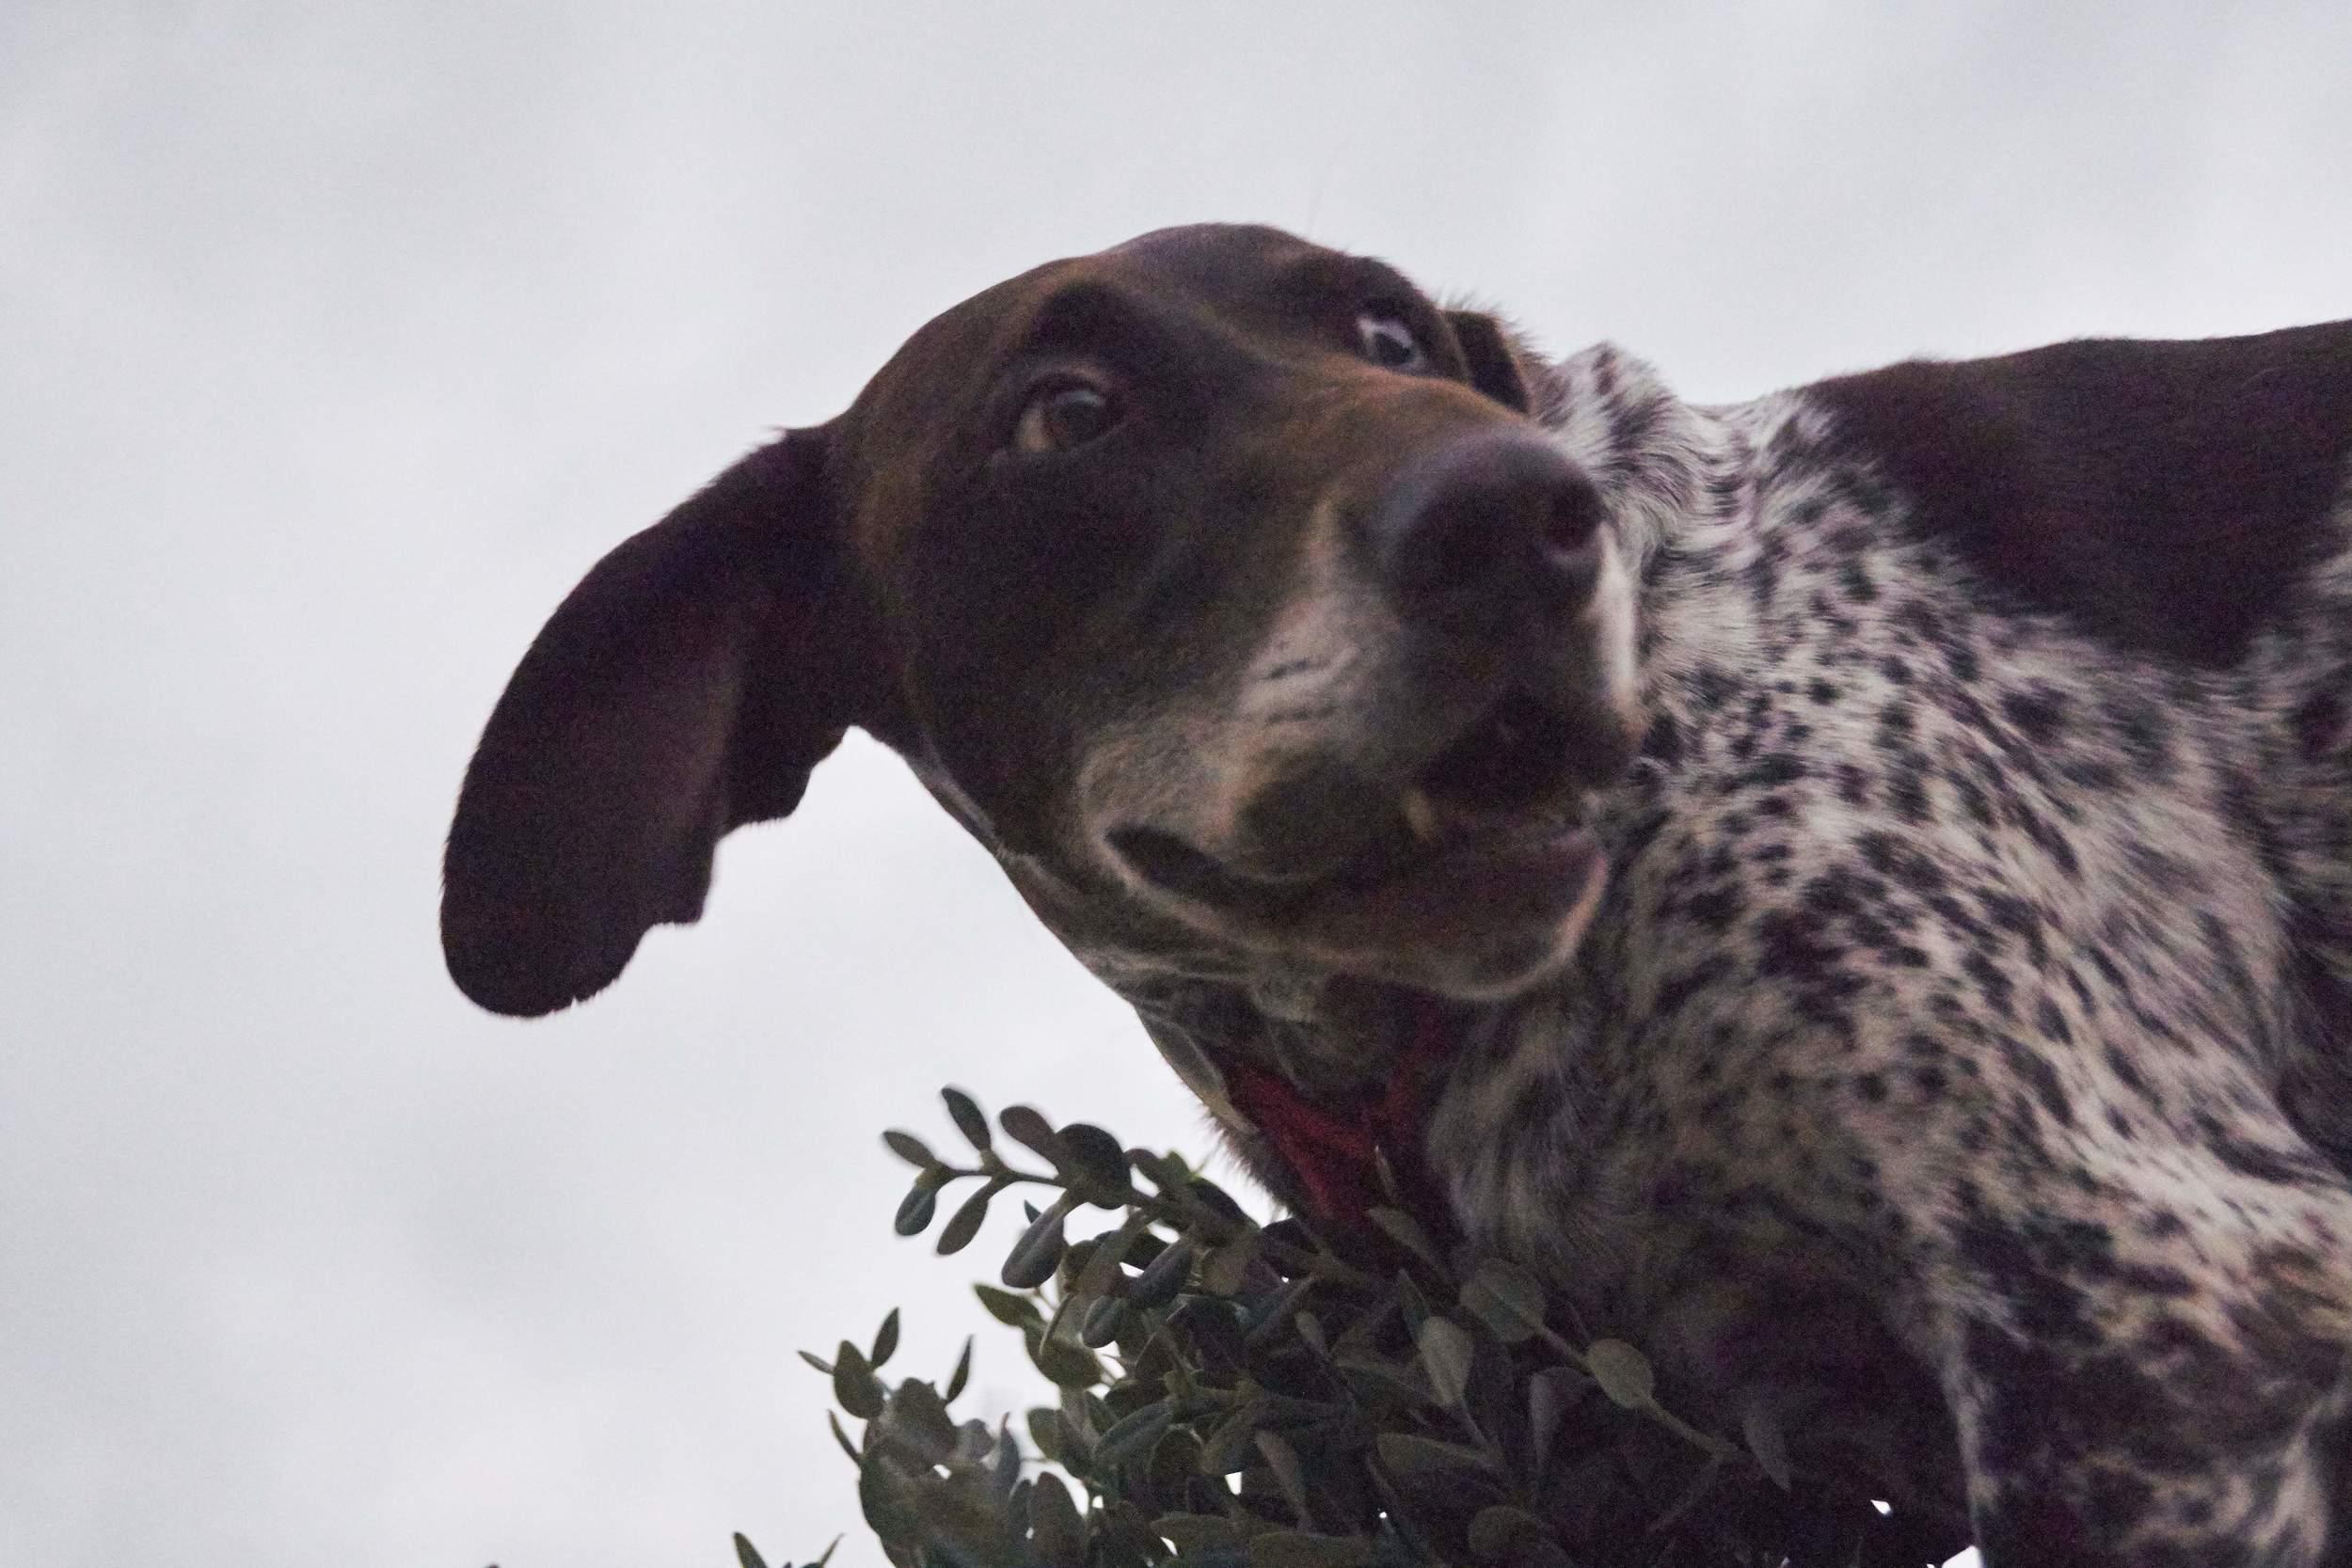 Victoria purebred hunting dog Kutcha | Mykonos dog rescue and adoption | Kelly Noguerol